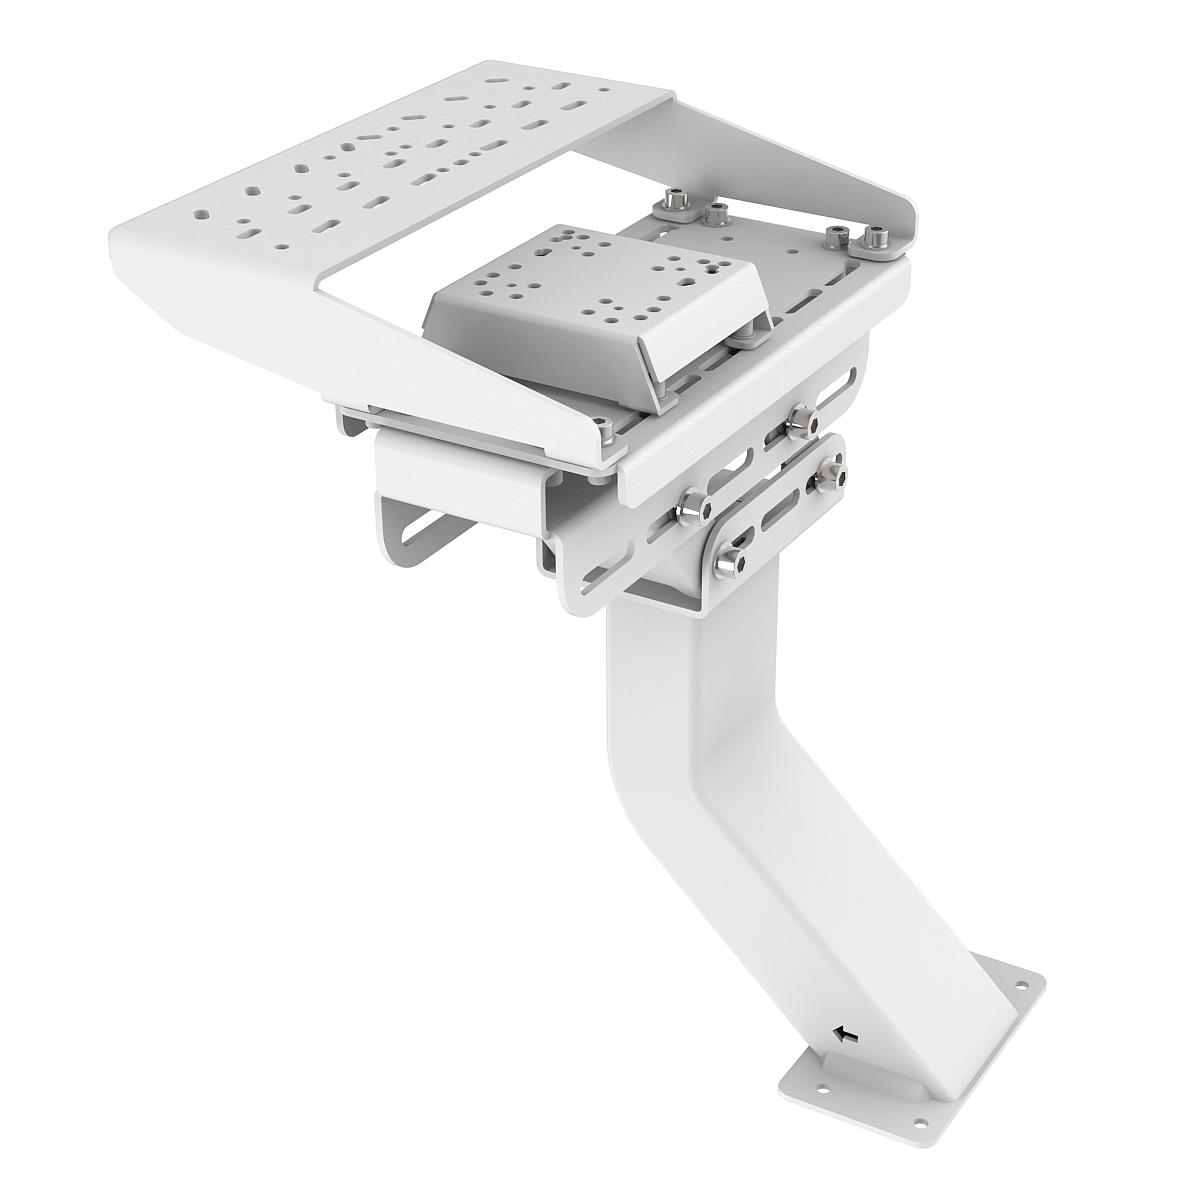 C1 Shifter / Handbrake Upgrade kit White